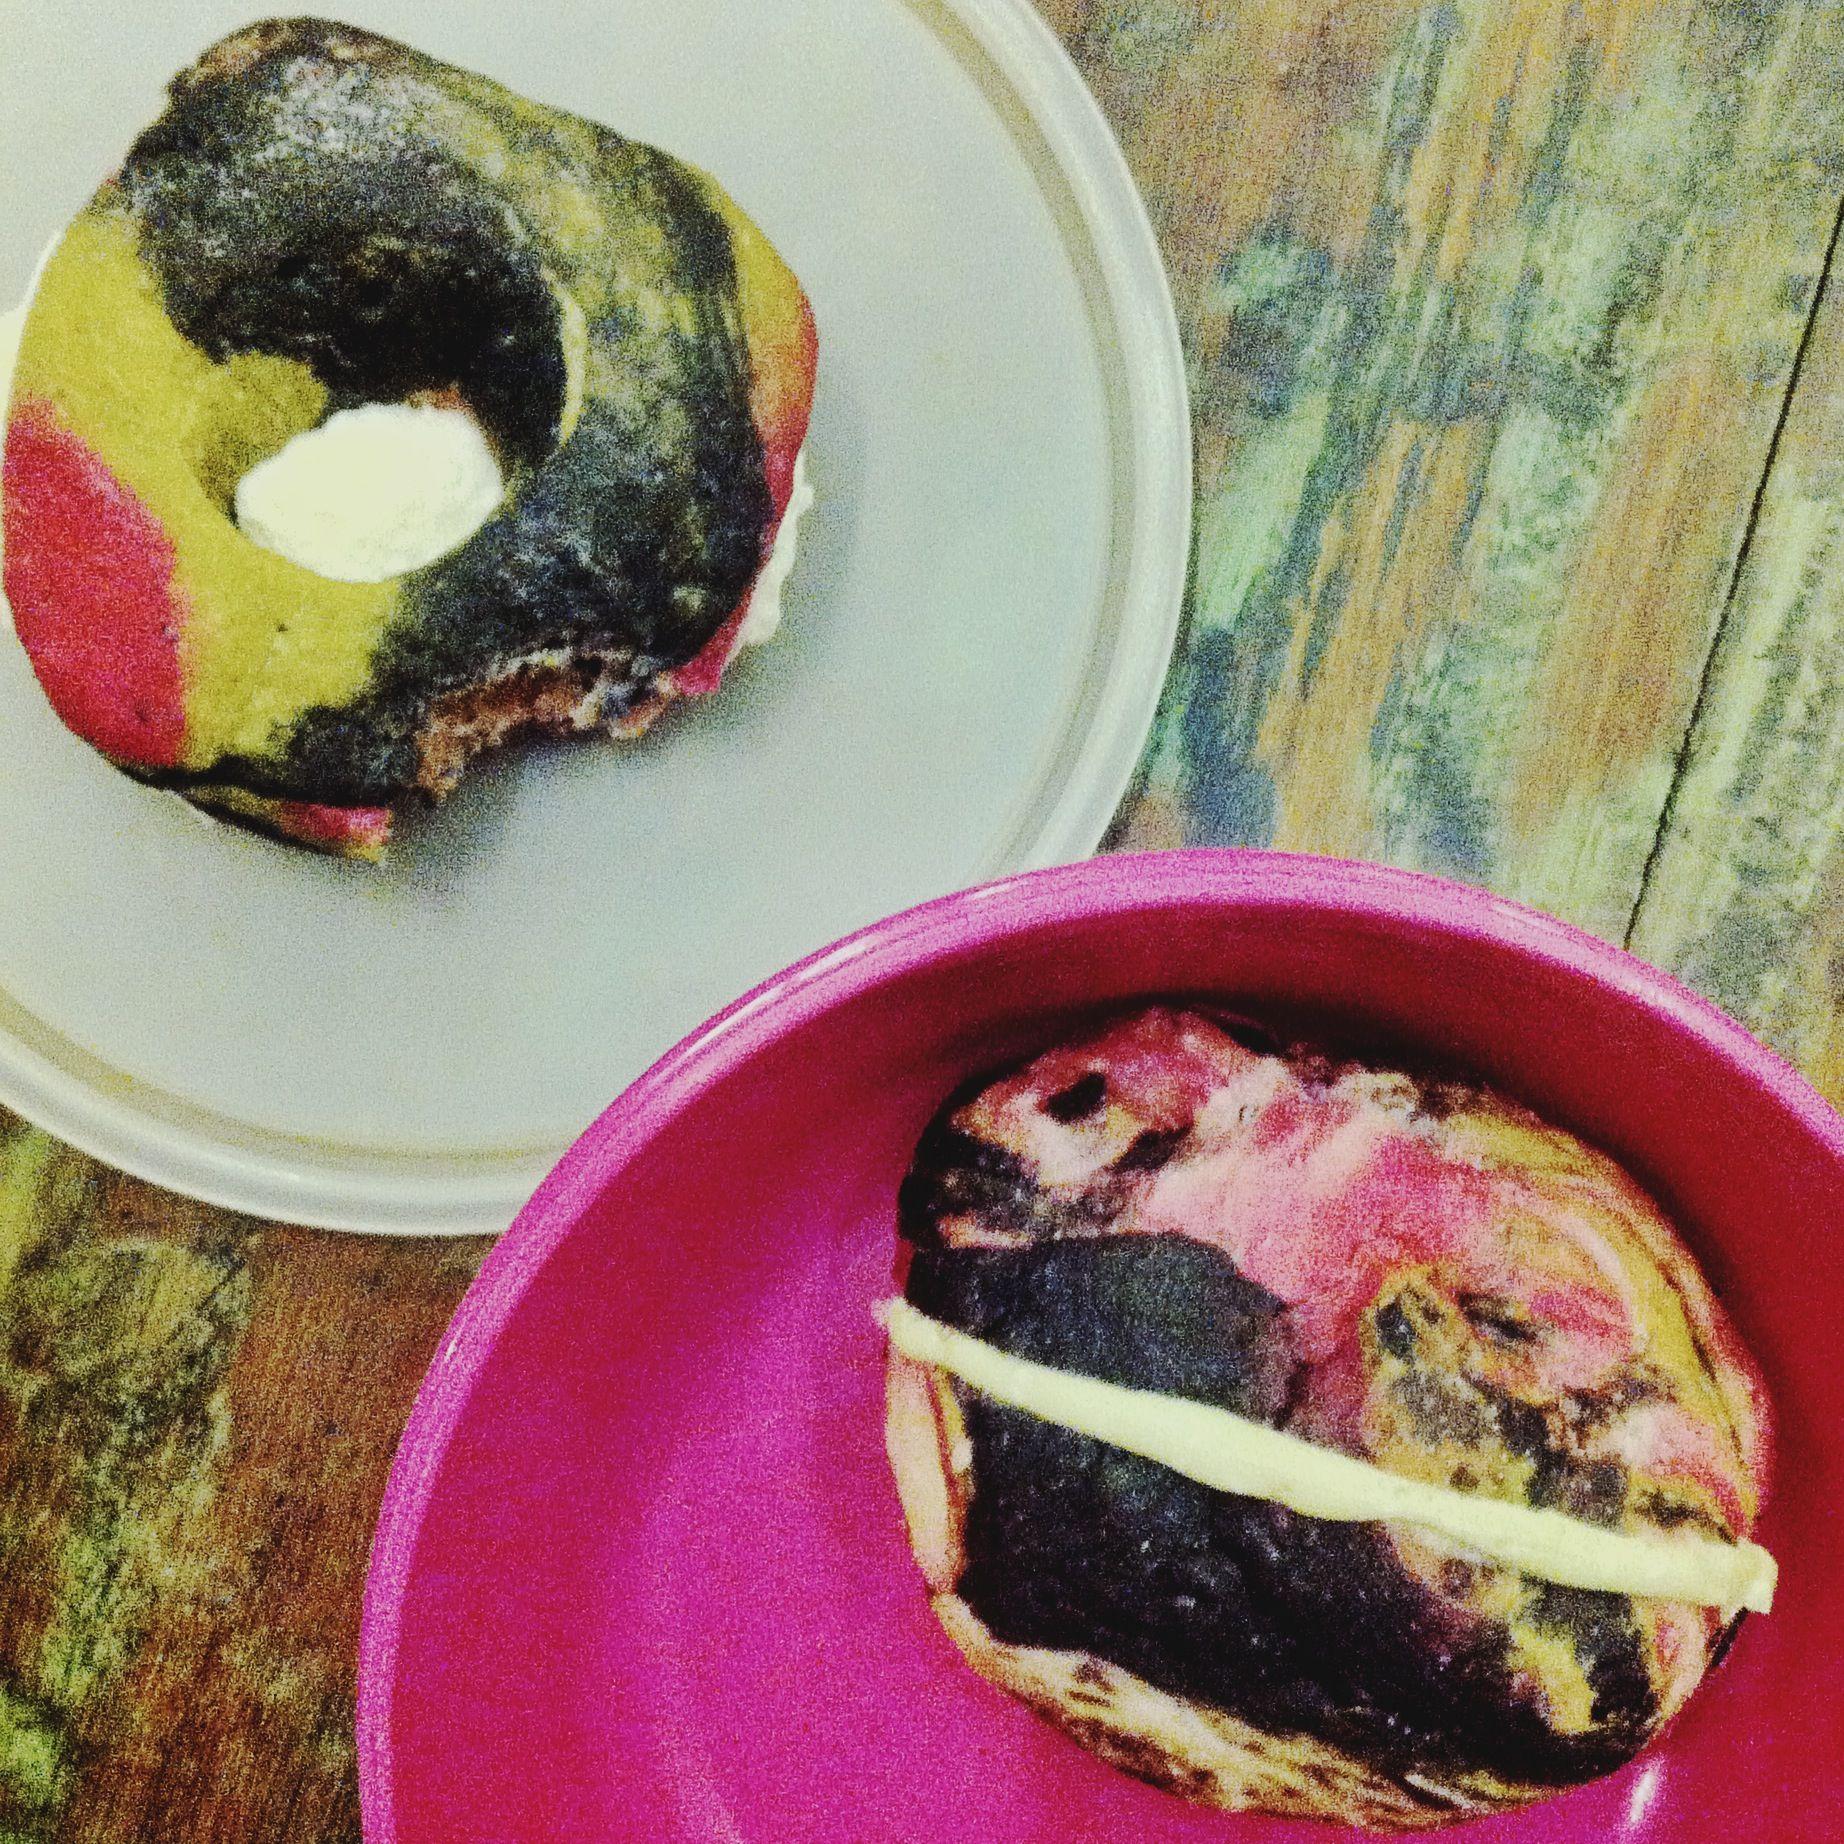 My personal favorite : Kebun Roti's natural yeast galaxy bread and donuts!